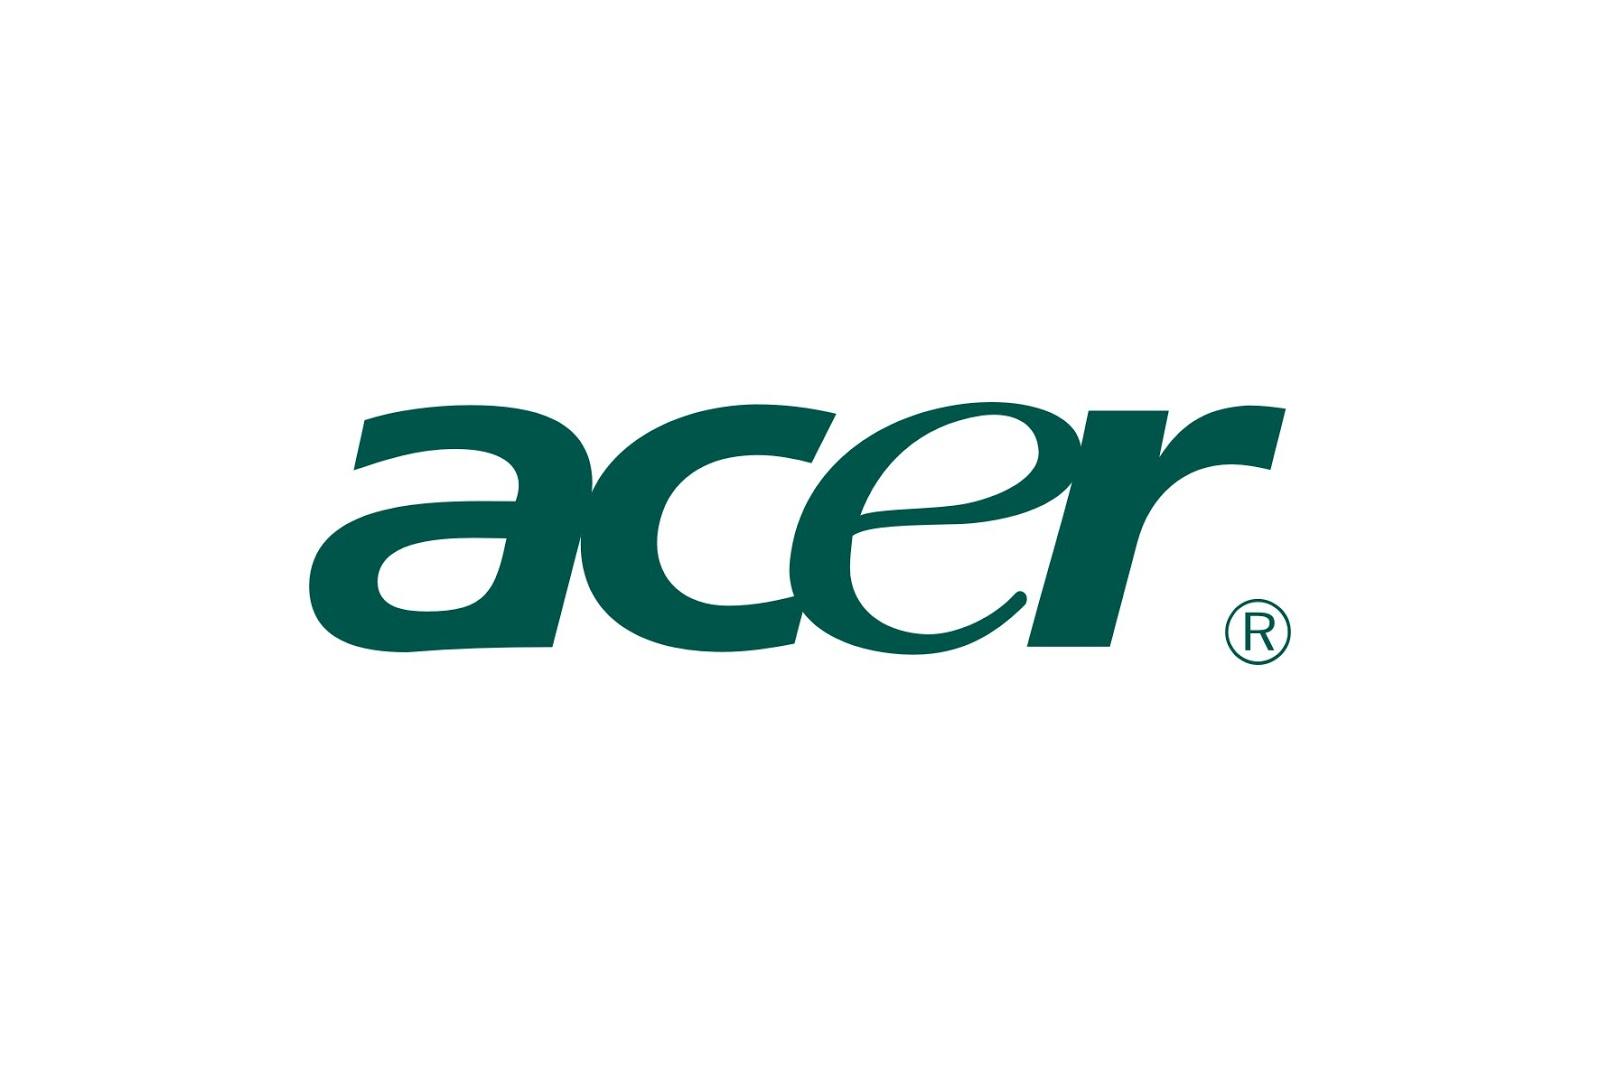 Acer badge Wallpaper